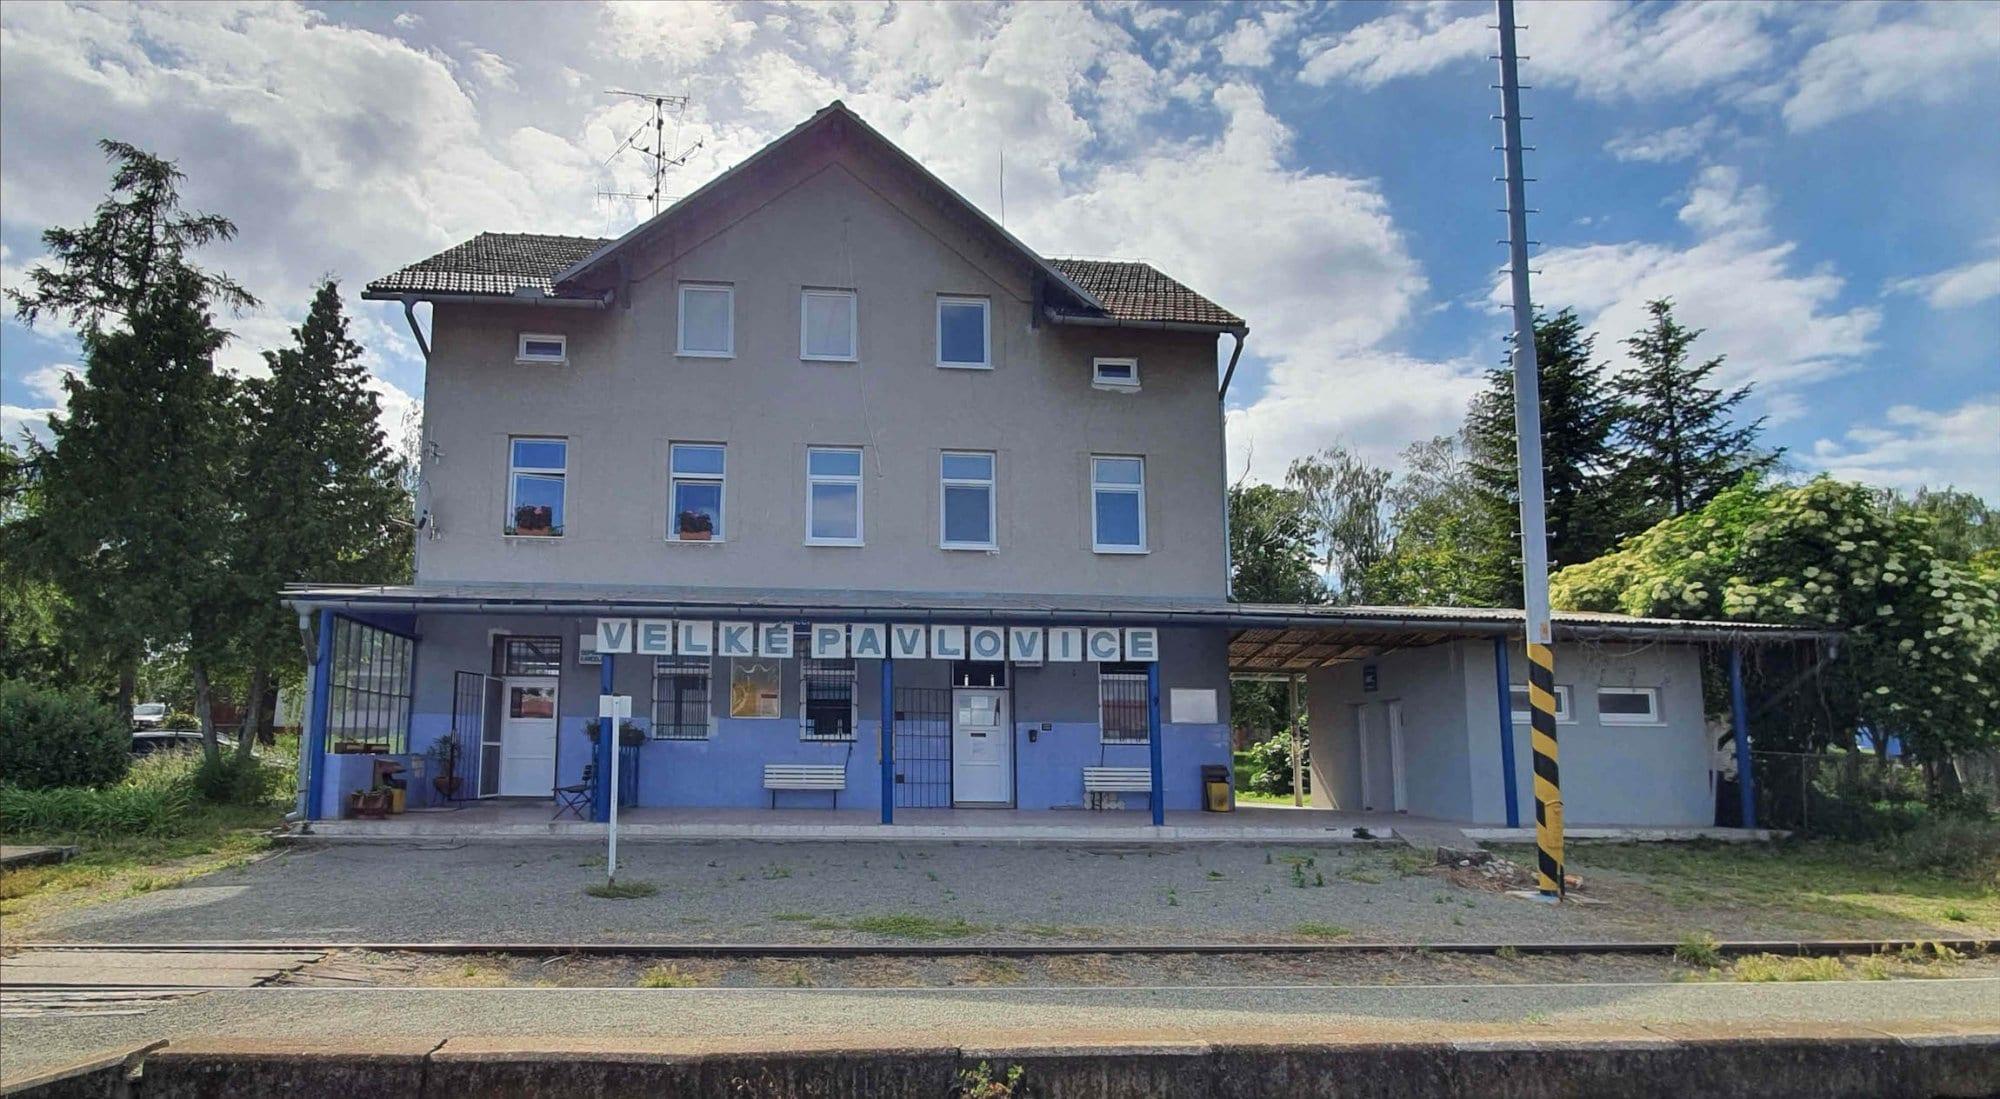 Train station Velke Pavlovice